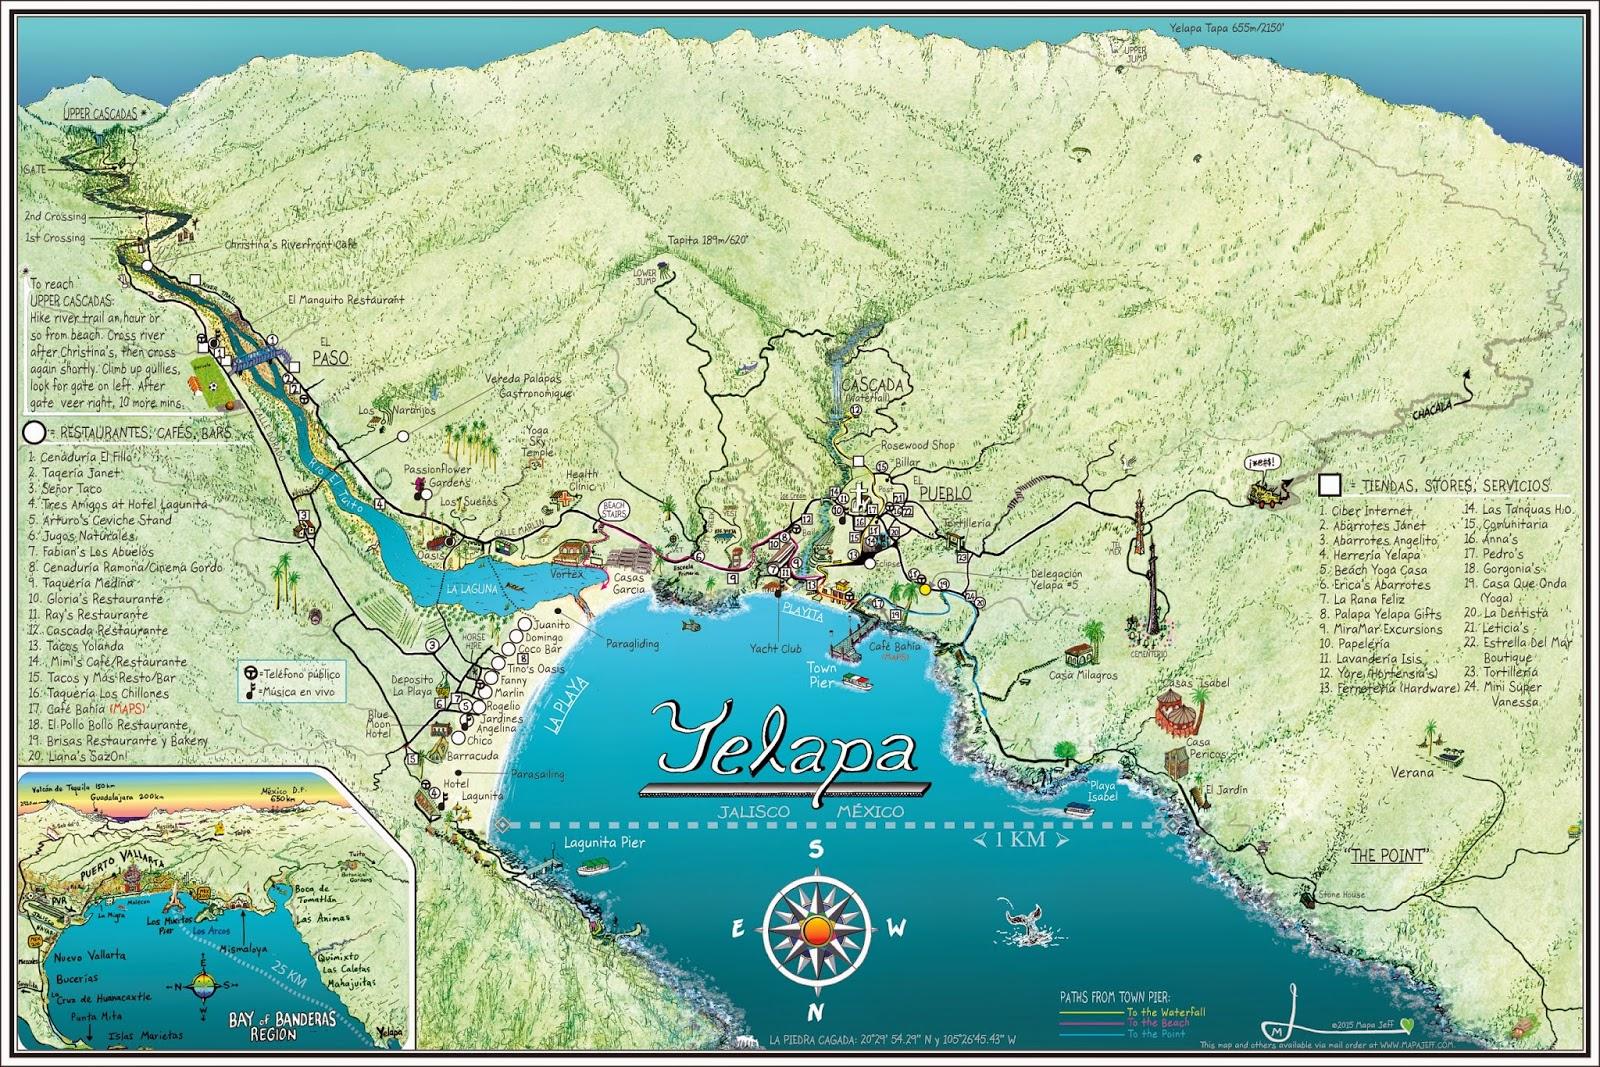 Mapa Jeff Cartography Yelapa 2015